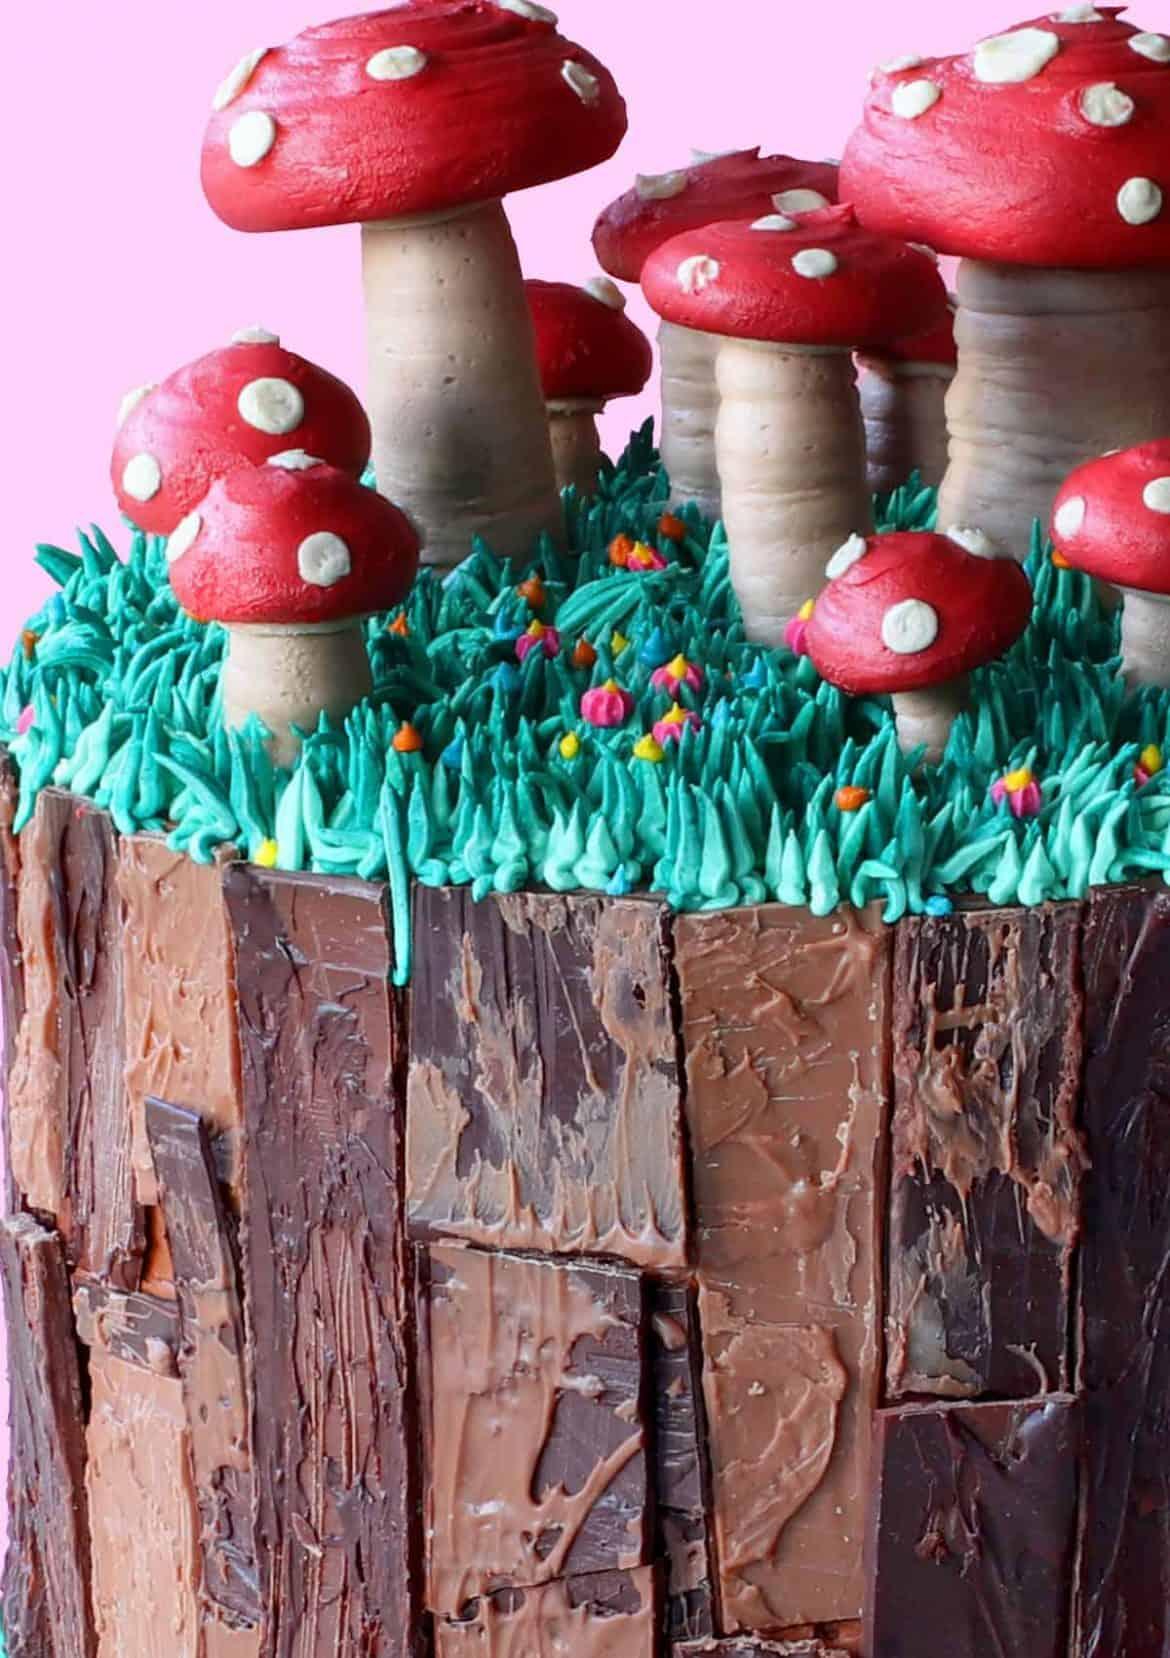 Close up of buttercream decorations on Magic Mushroom Cake